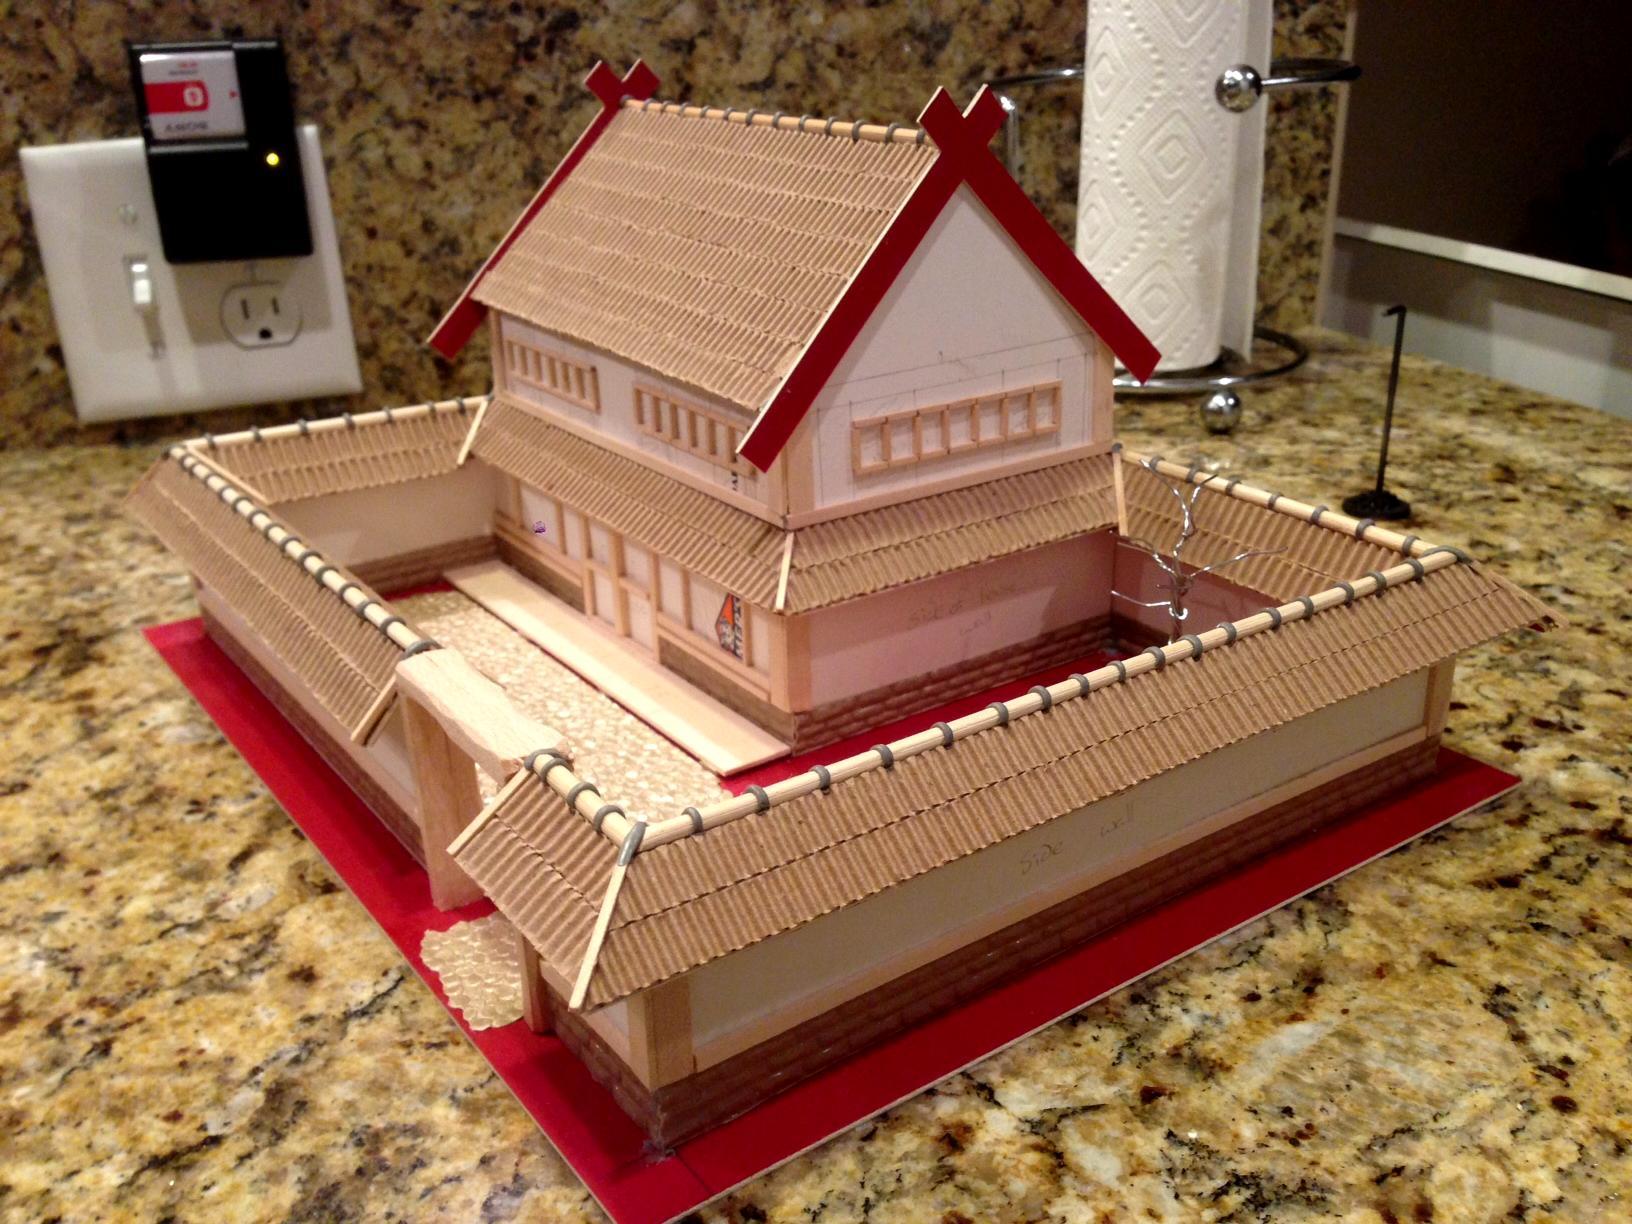 House, Samurai, Scratch Build, Terrain